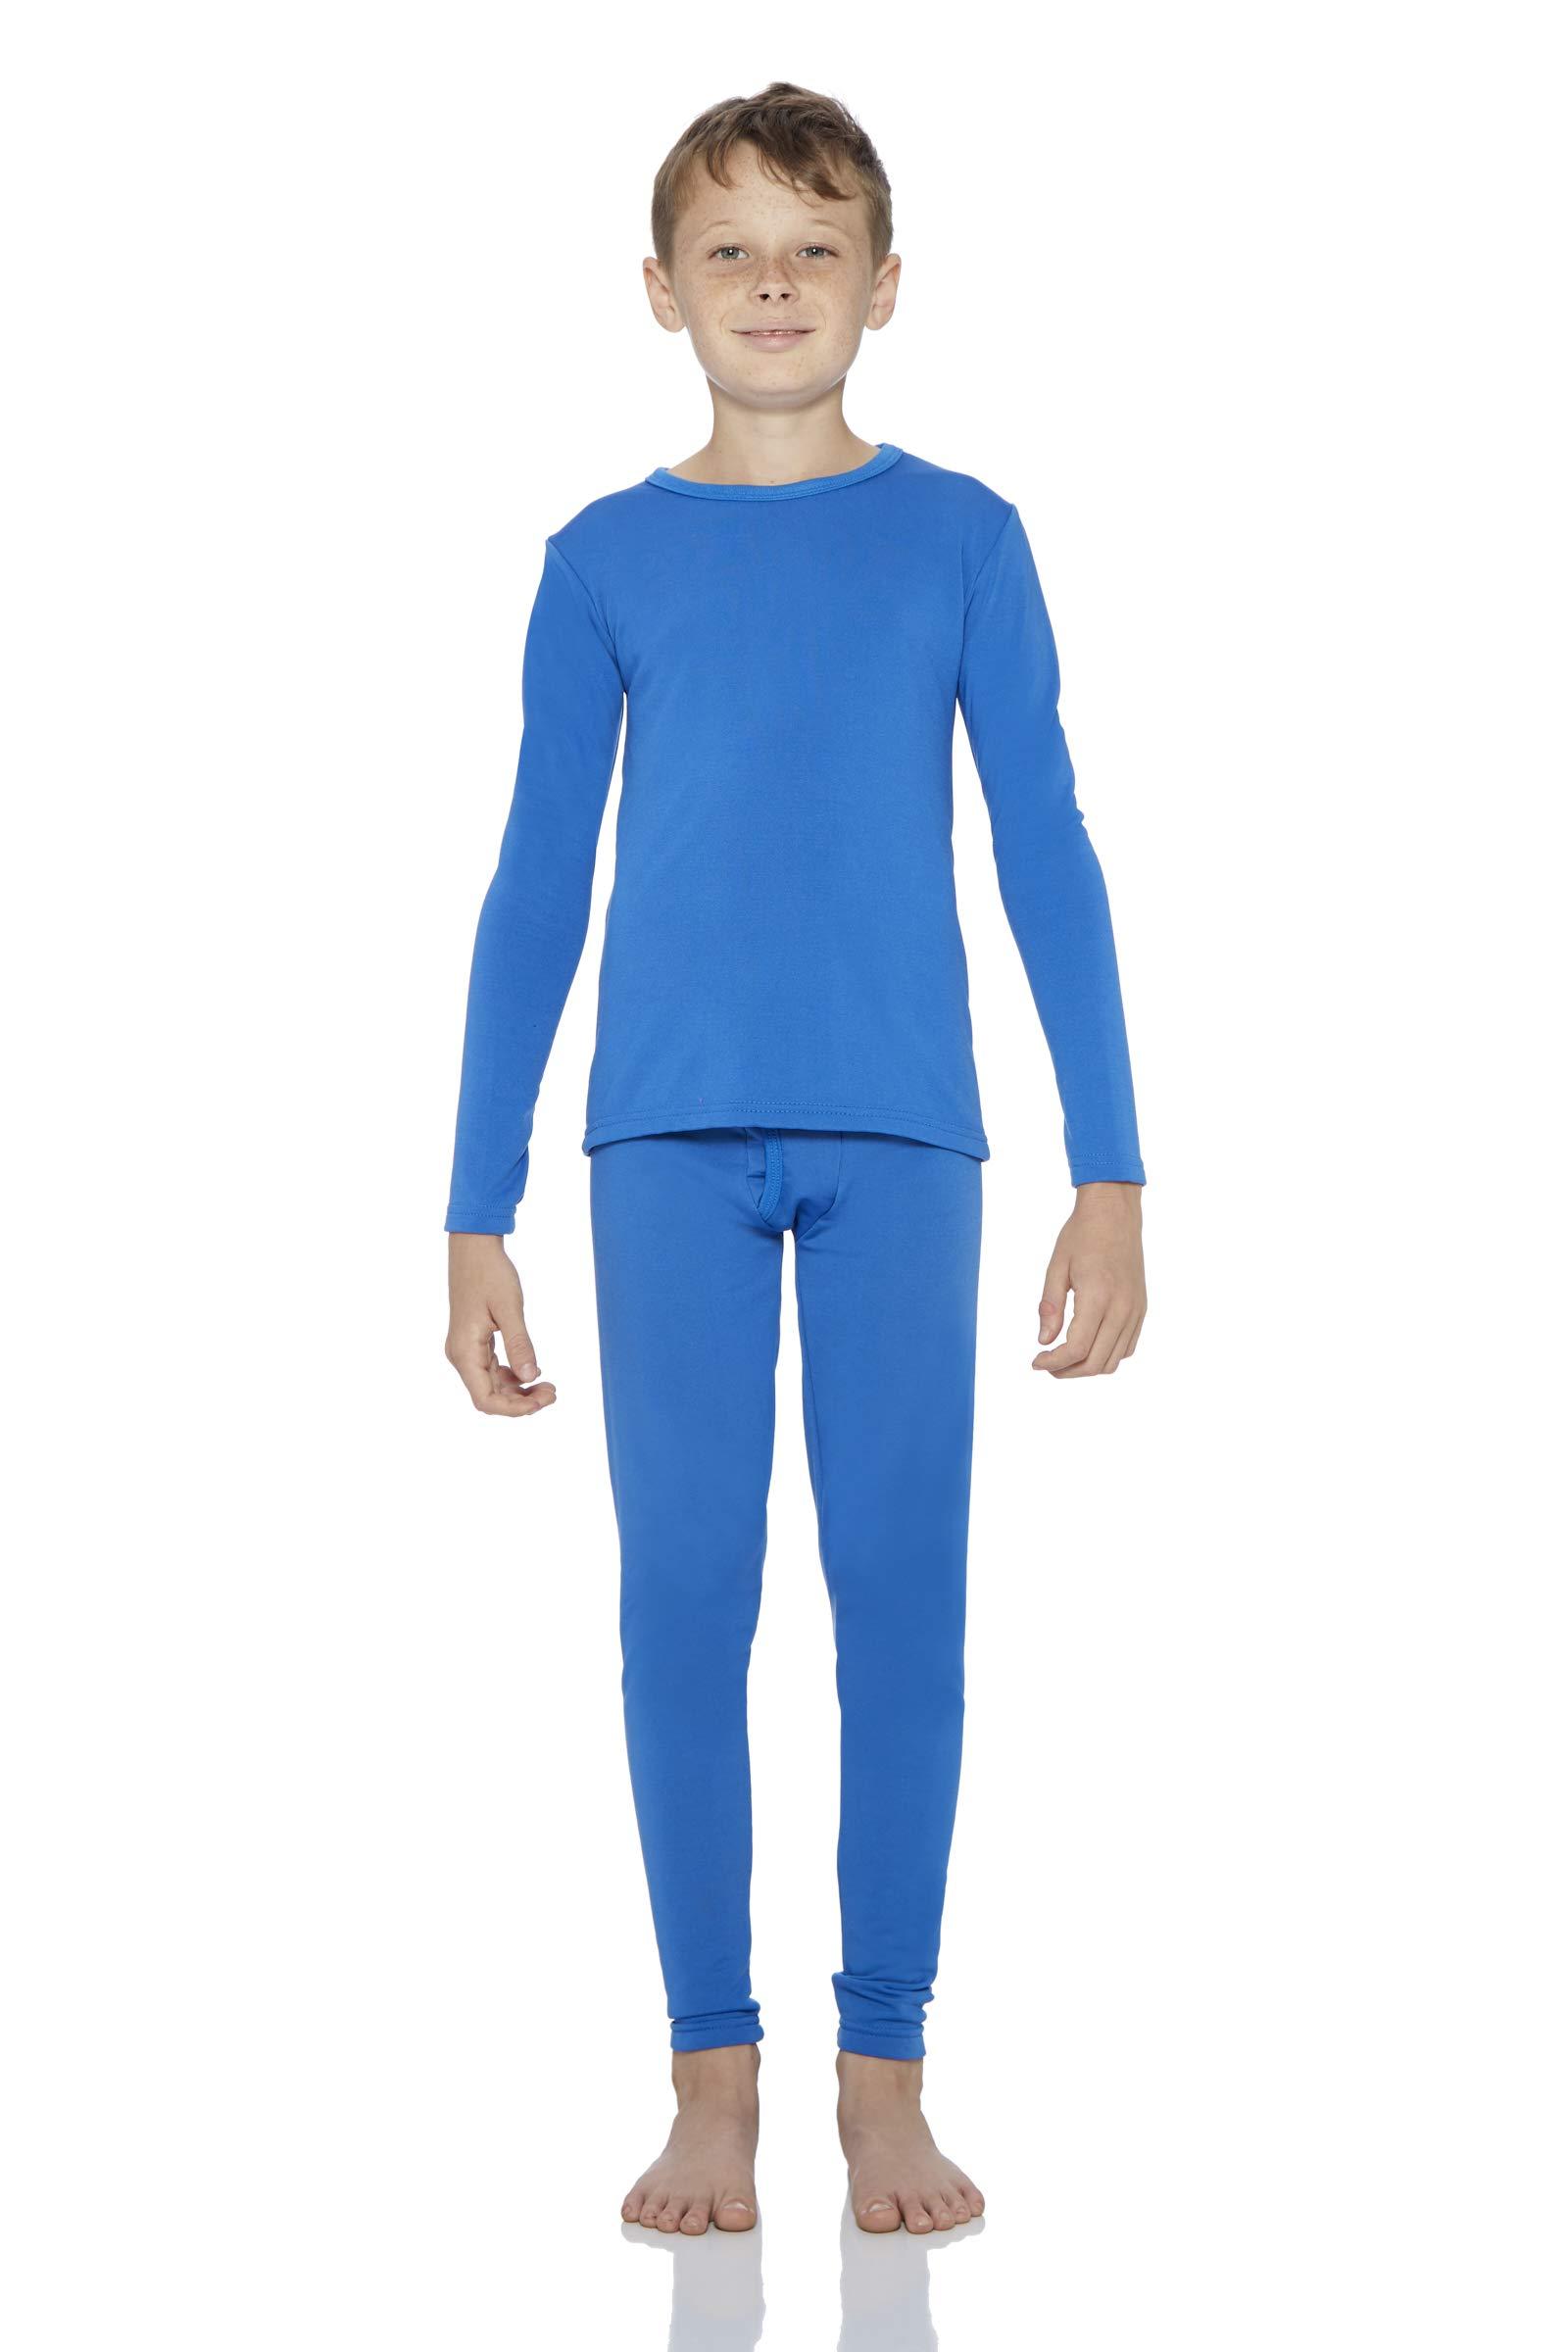 Rocky Boy's Fleece Lined Thermal Underwear 2PC Set Long John Top and Bottom (S, Blue)